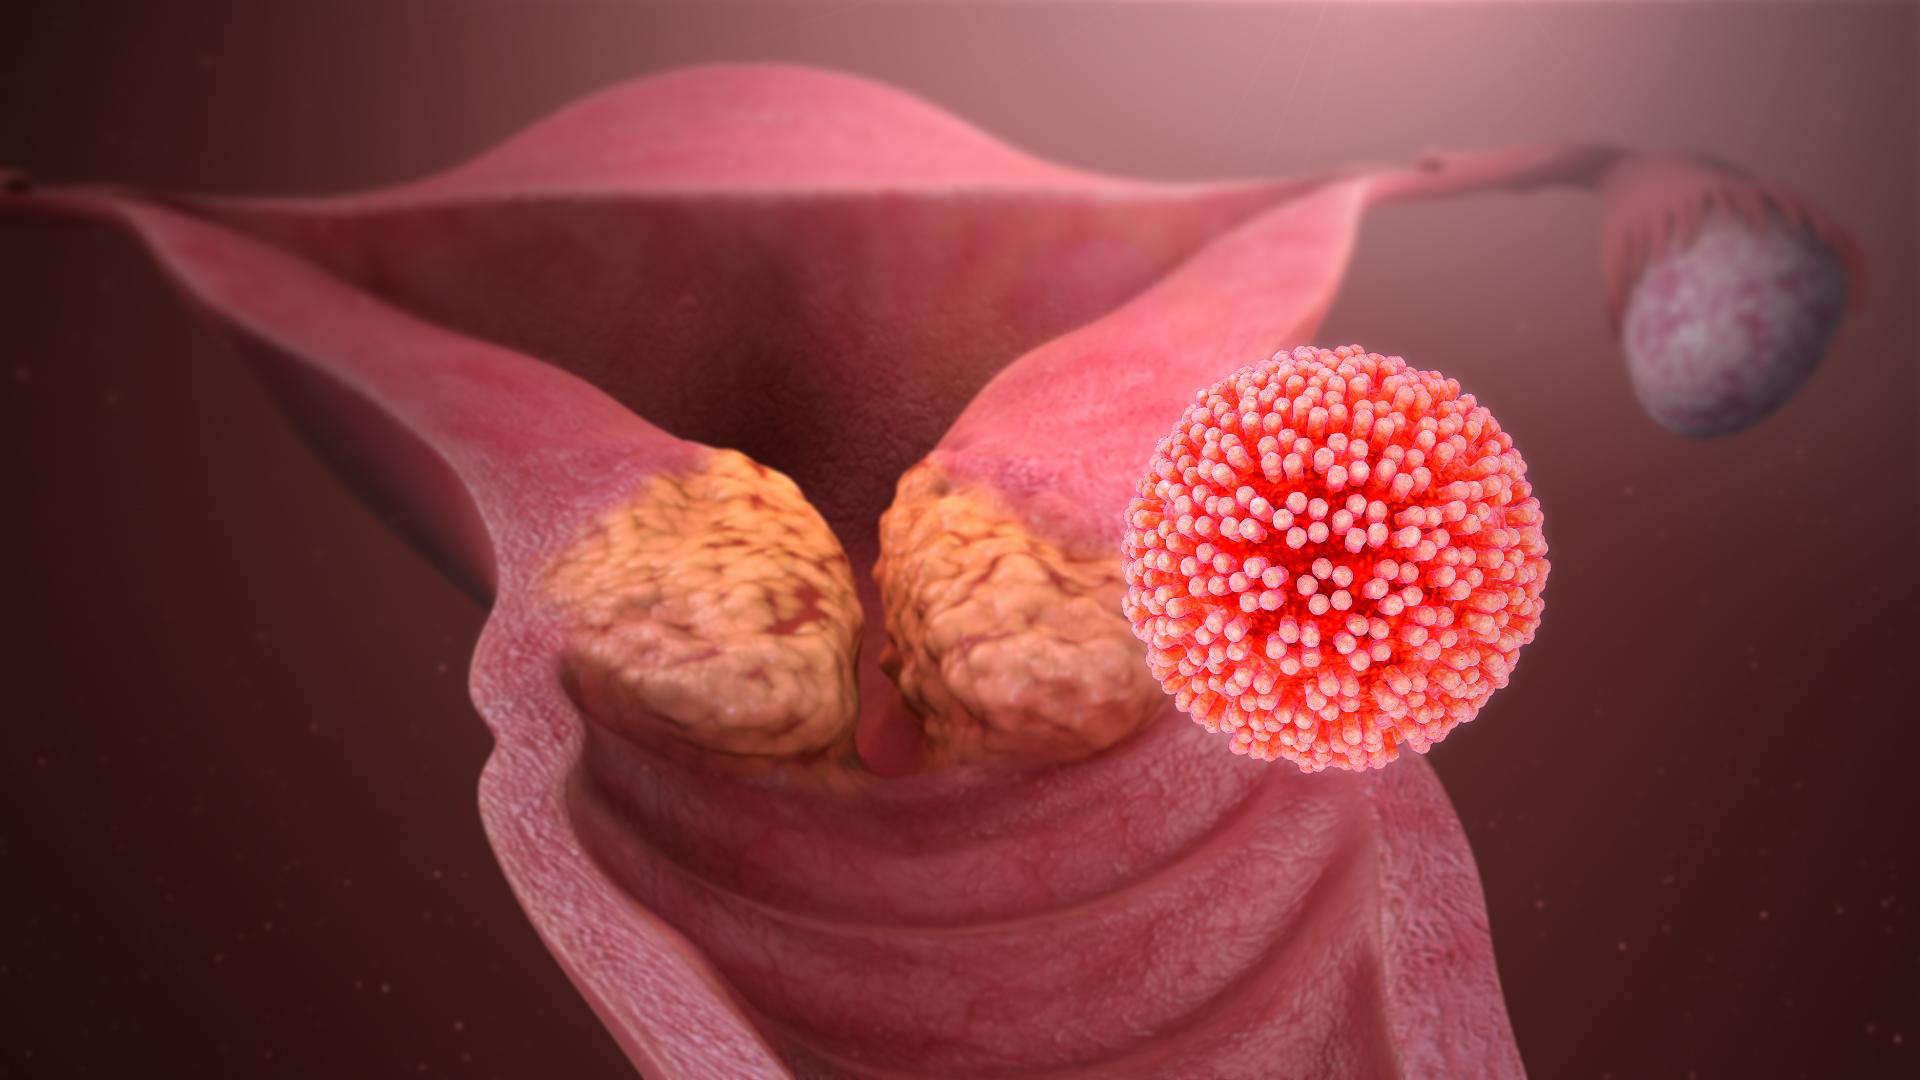 ricerca sul papilloma virus papiloma en el boca